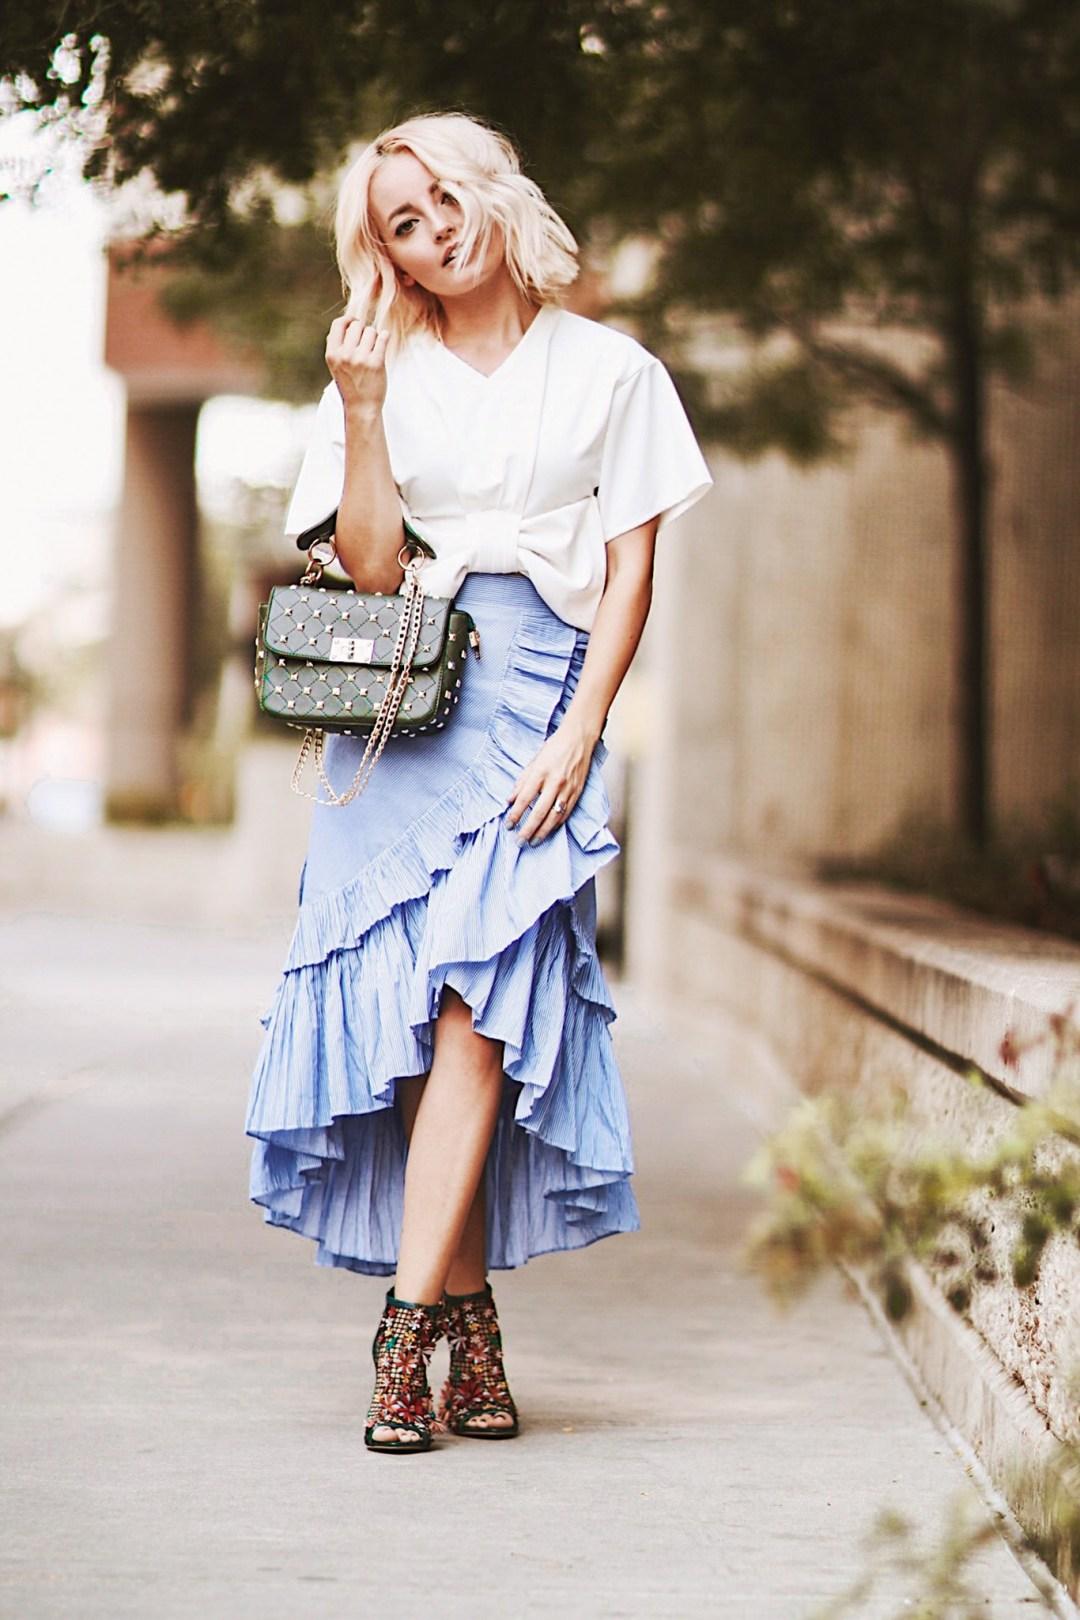 Alena Gidenko of modaprints.com styles a denim ruffle skirt from ChicWish